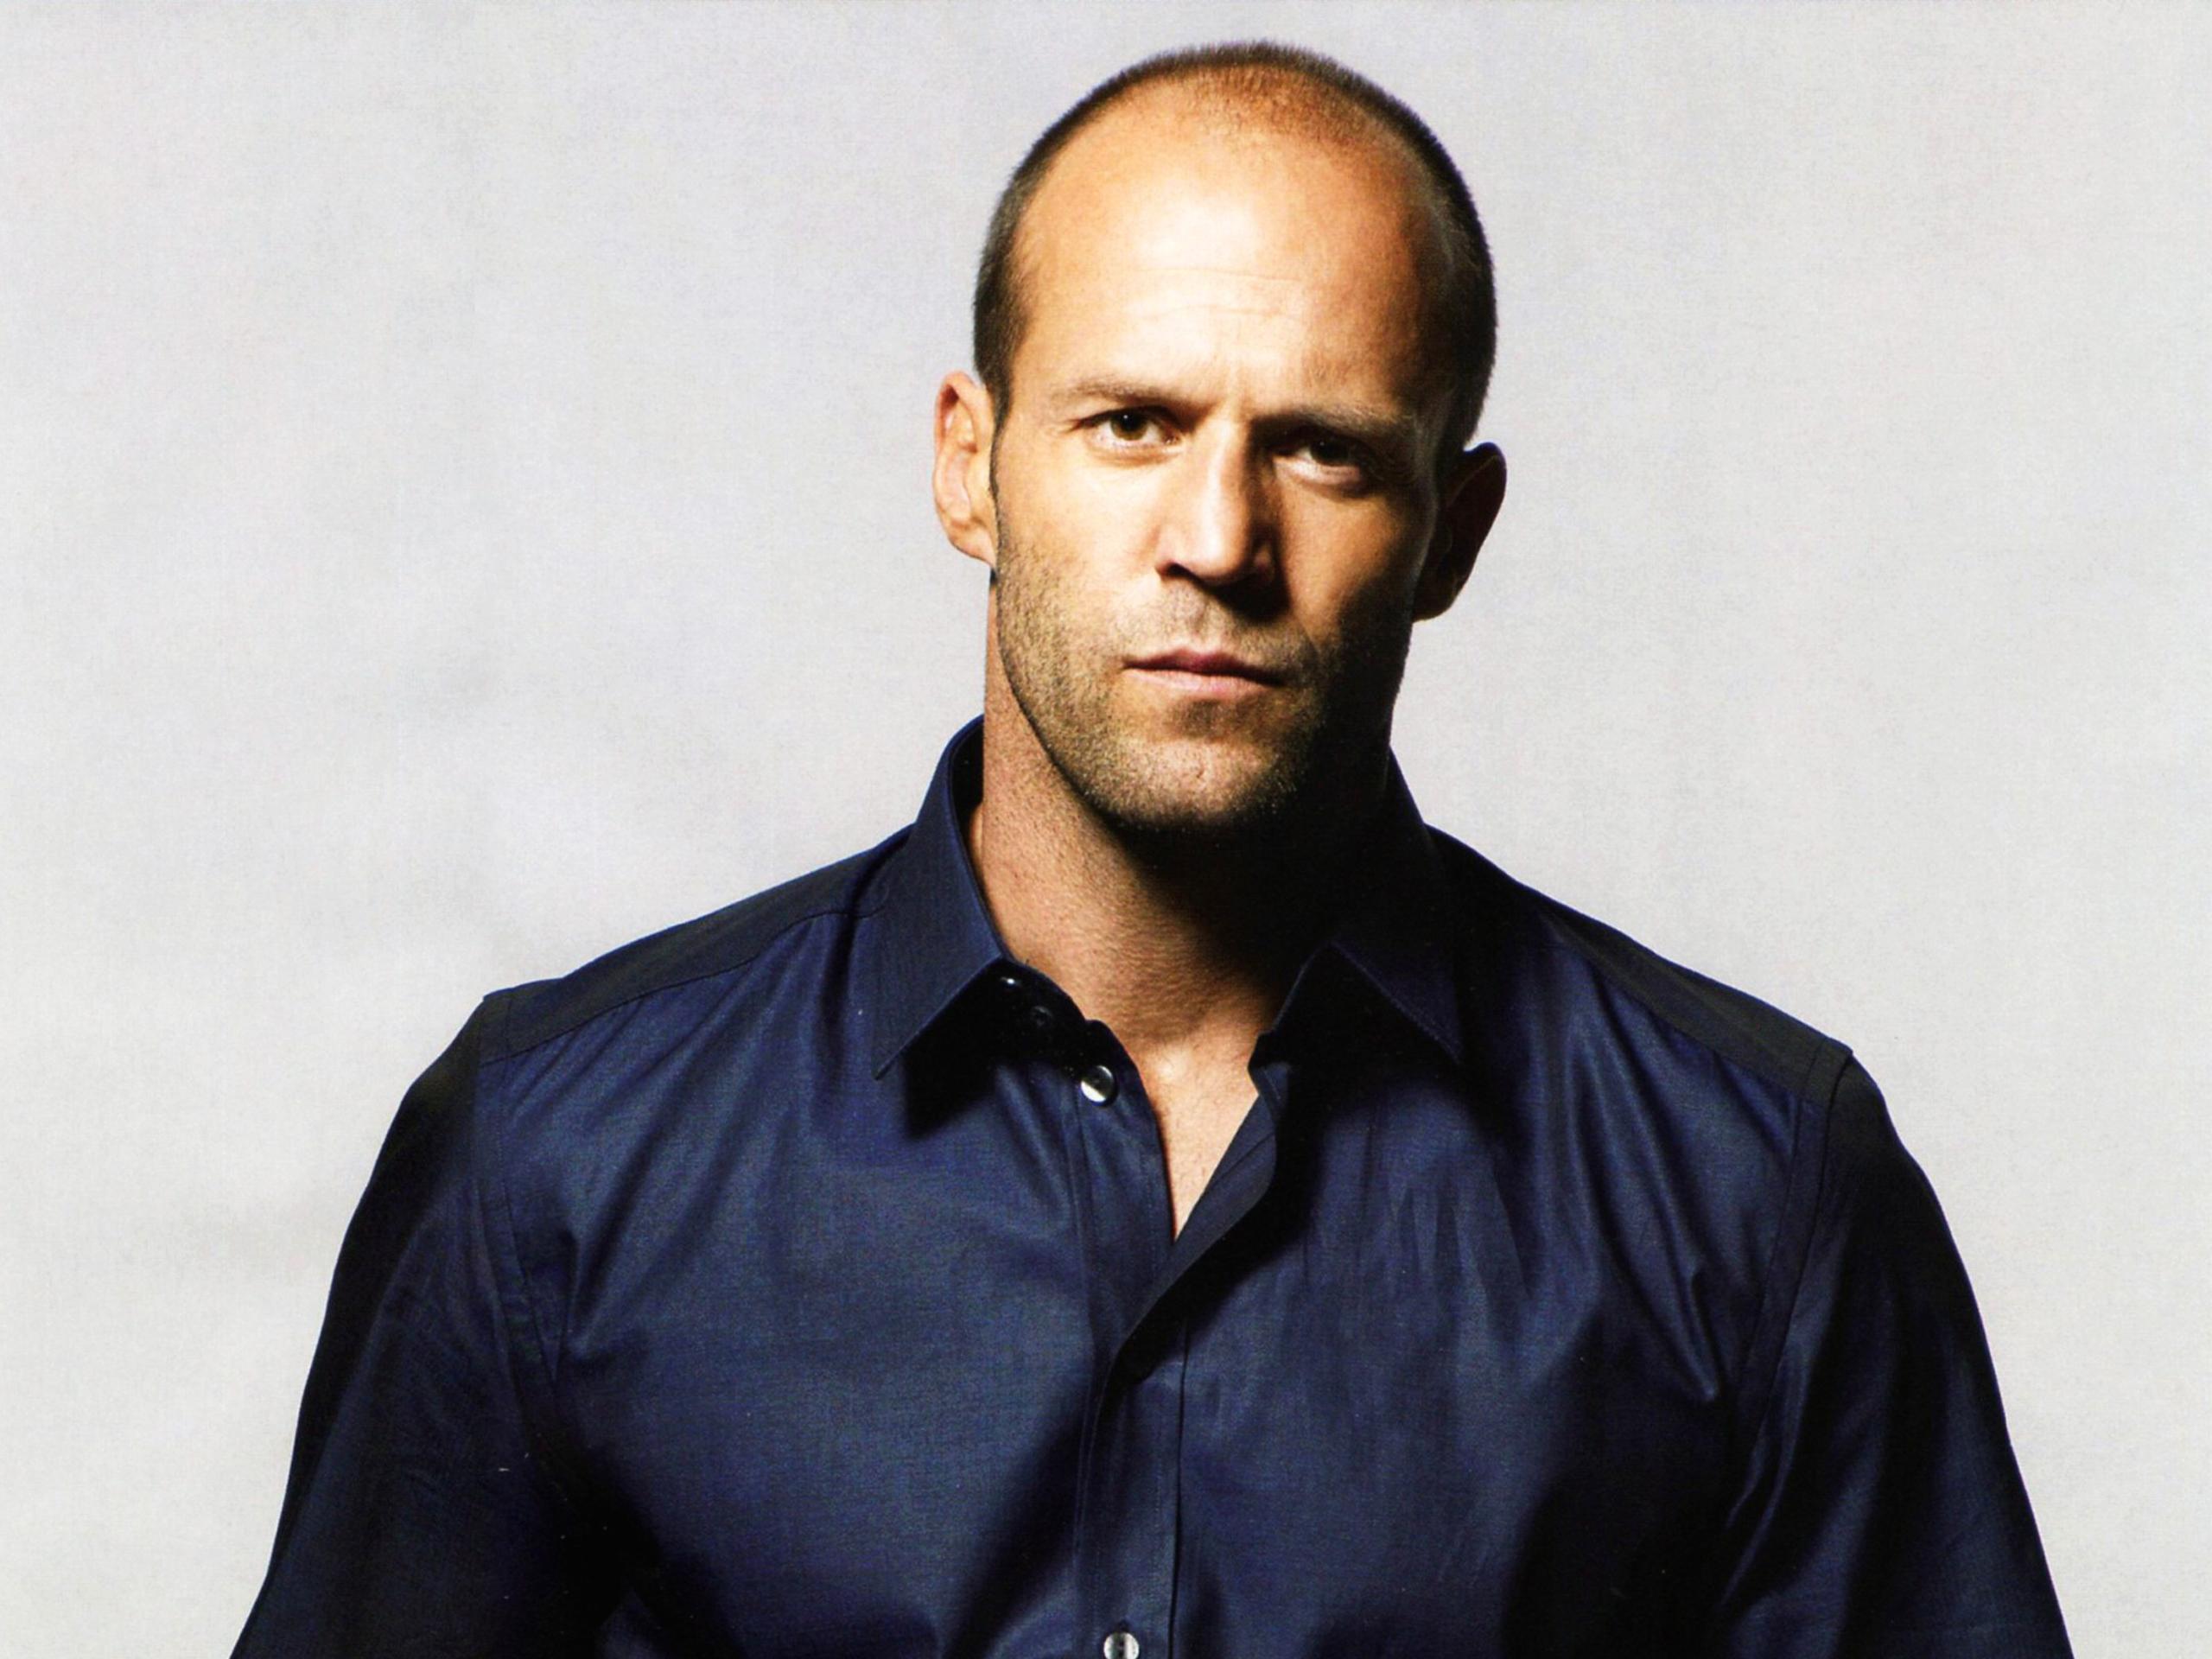 Good looking bald celeb